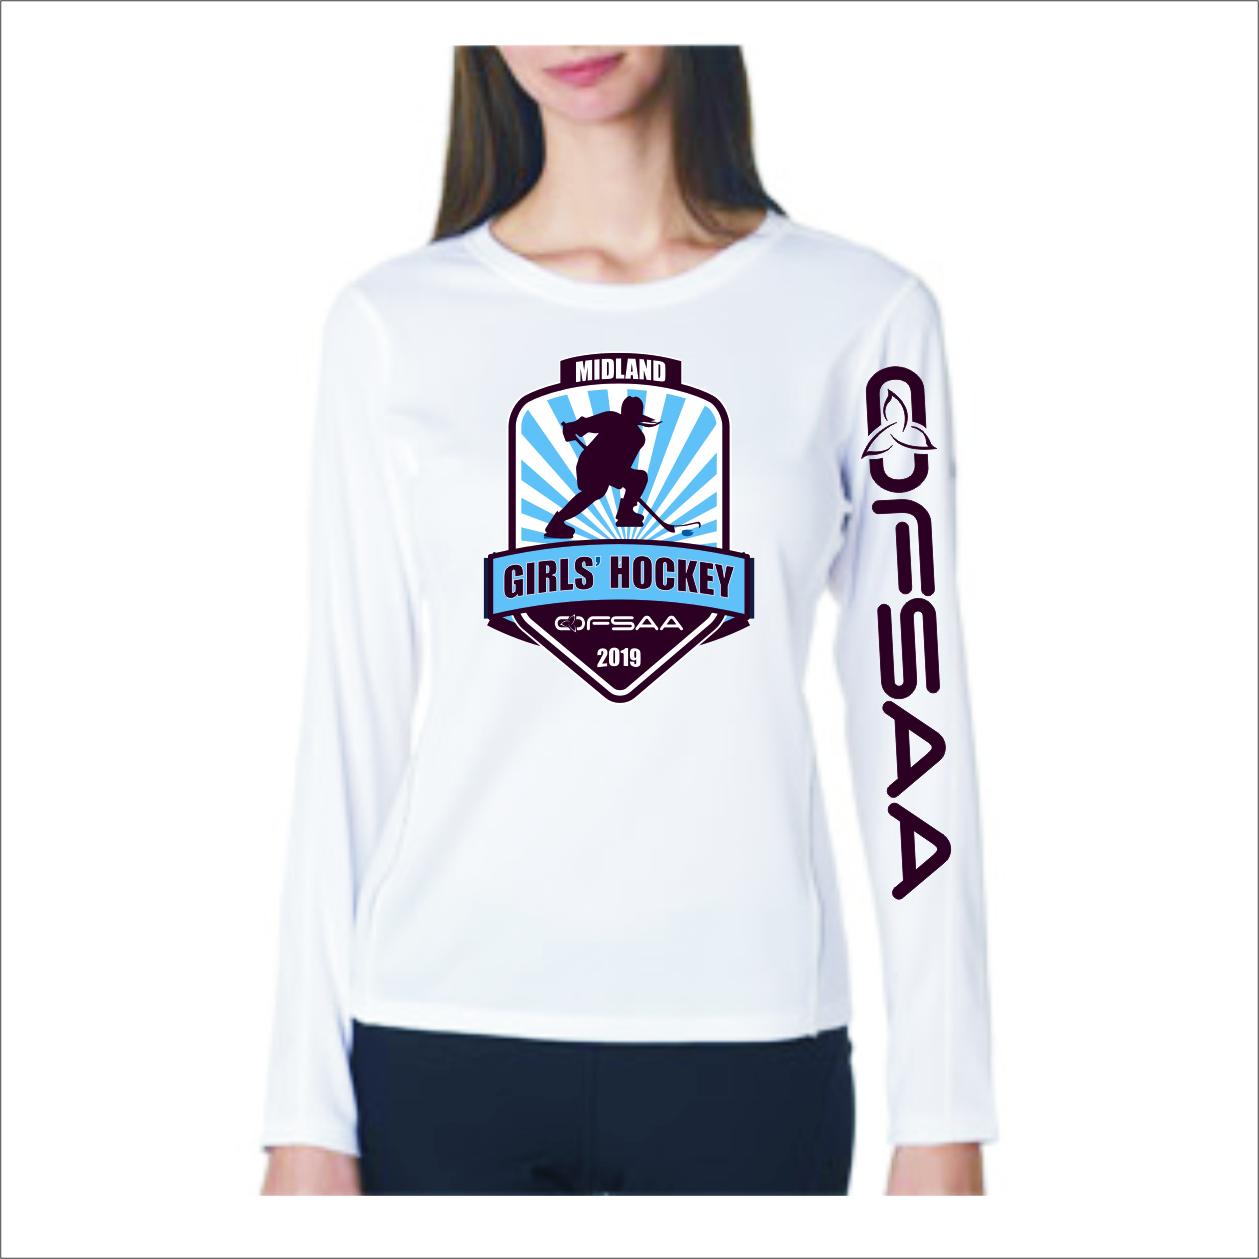 2019 Girls Hockey Women LS single.jpg